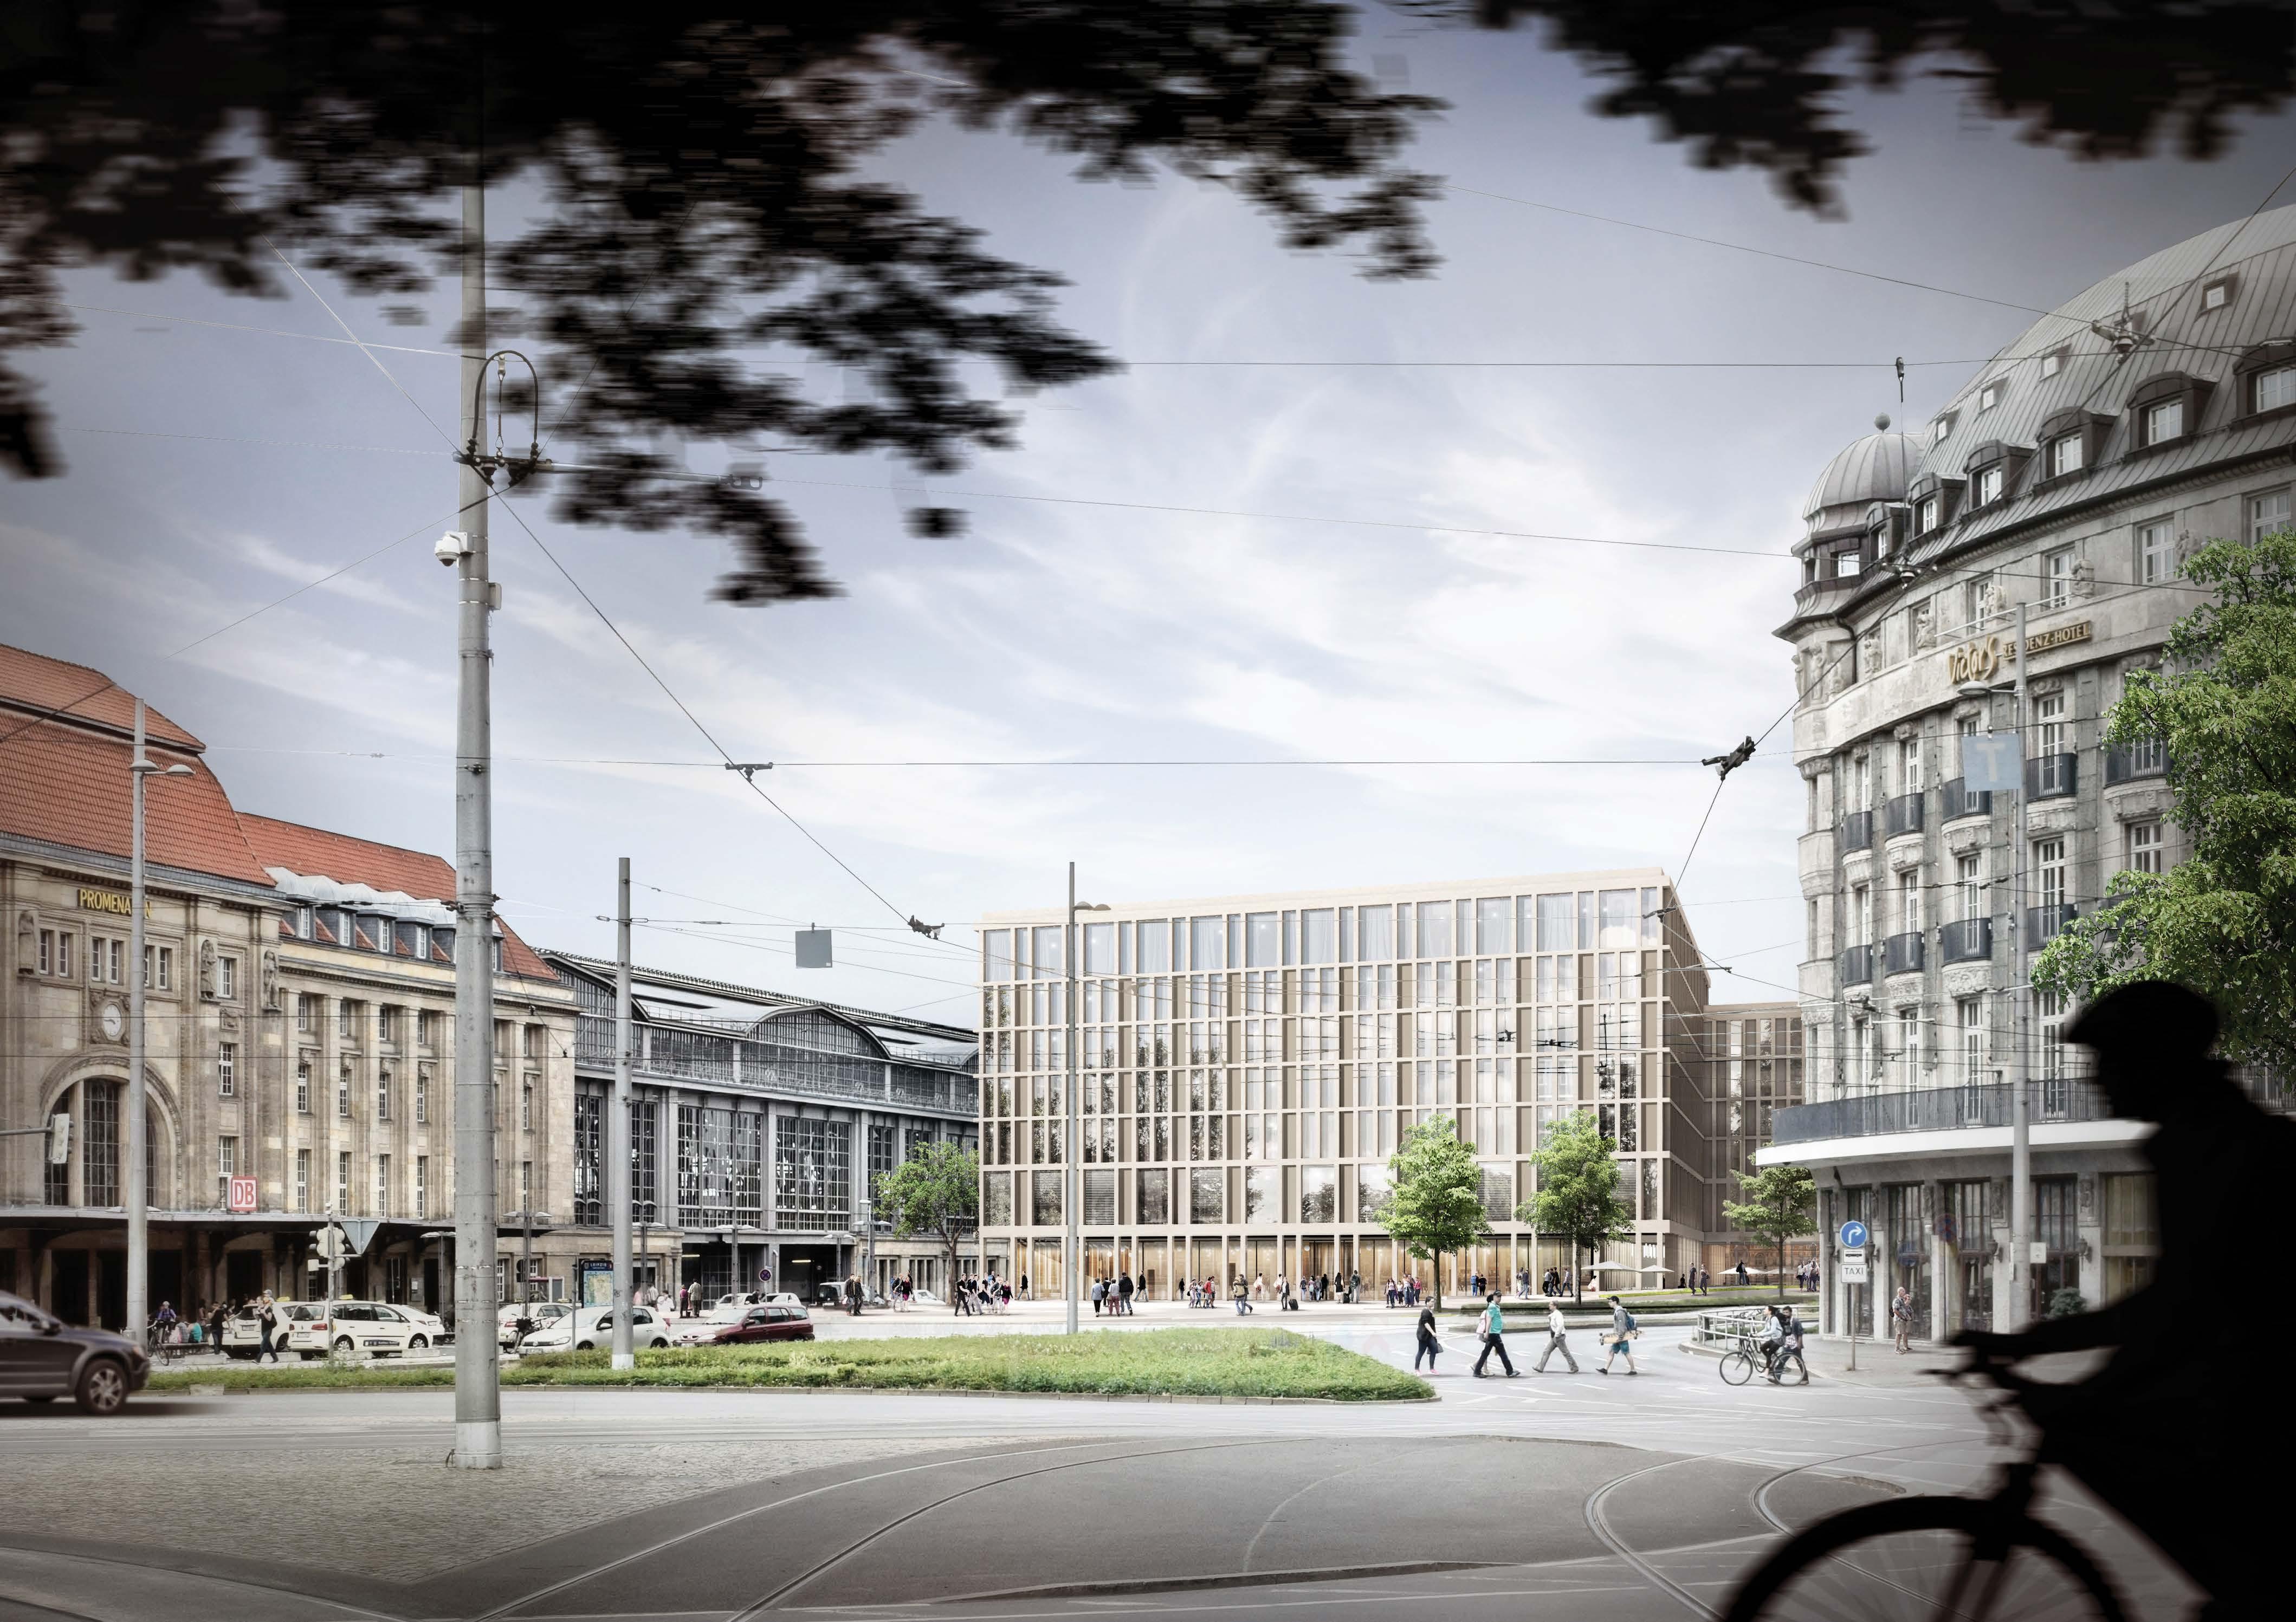 Architekten In Leipzig leipzig station east side gerber architekten